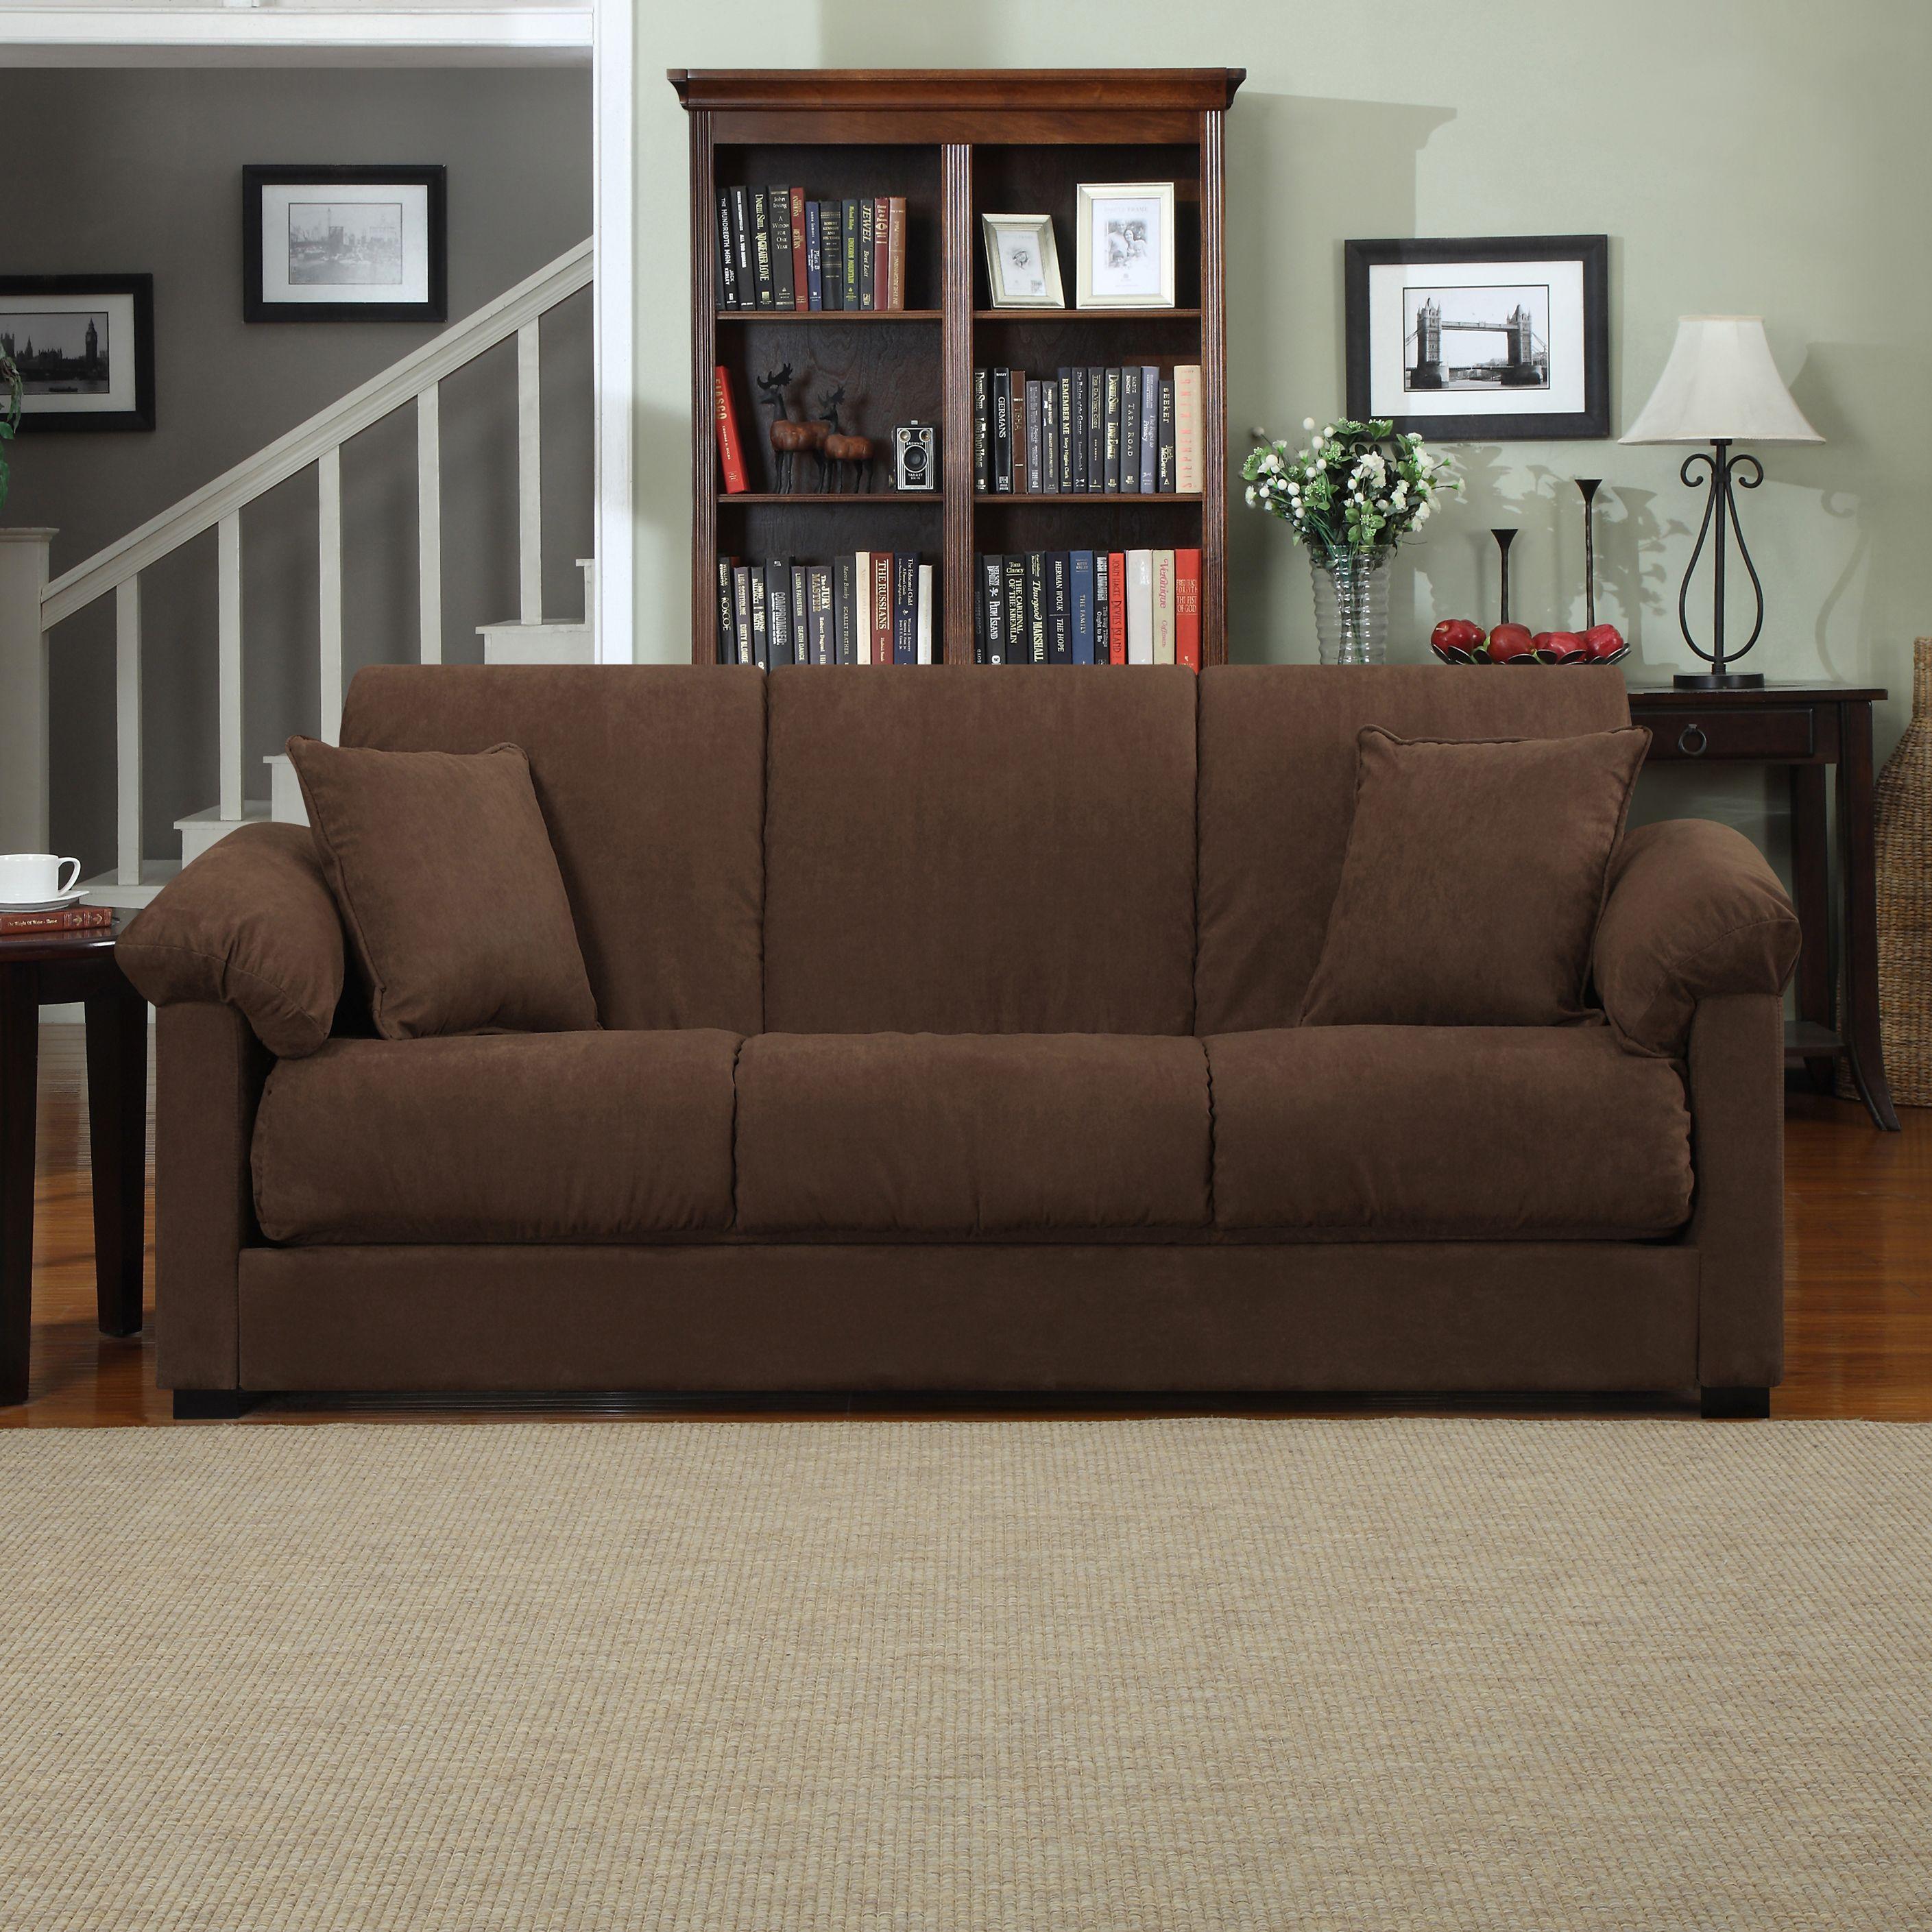 thomas bed pin microfiber sleeper best inspirational of queen sofa